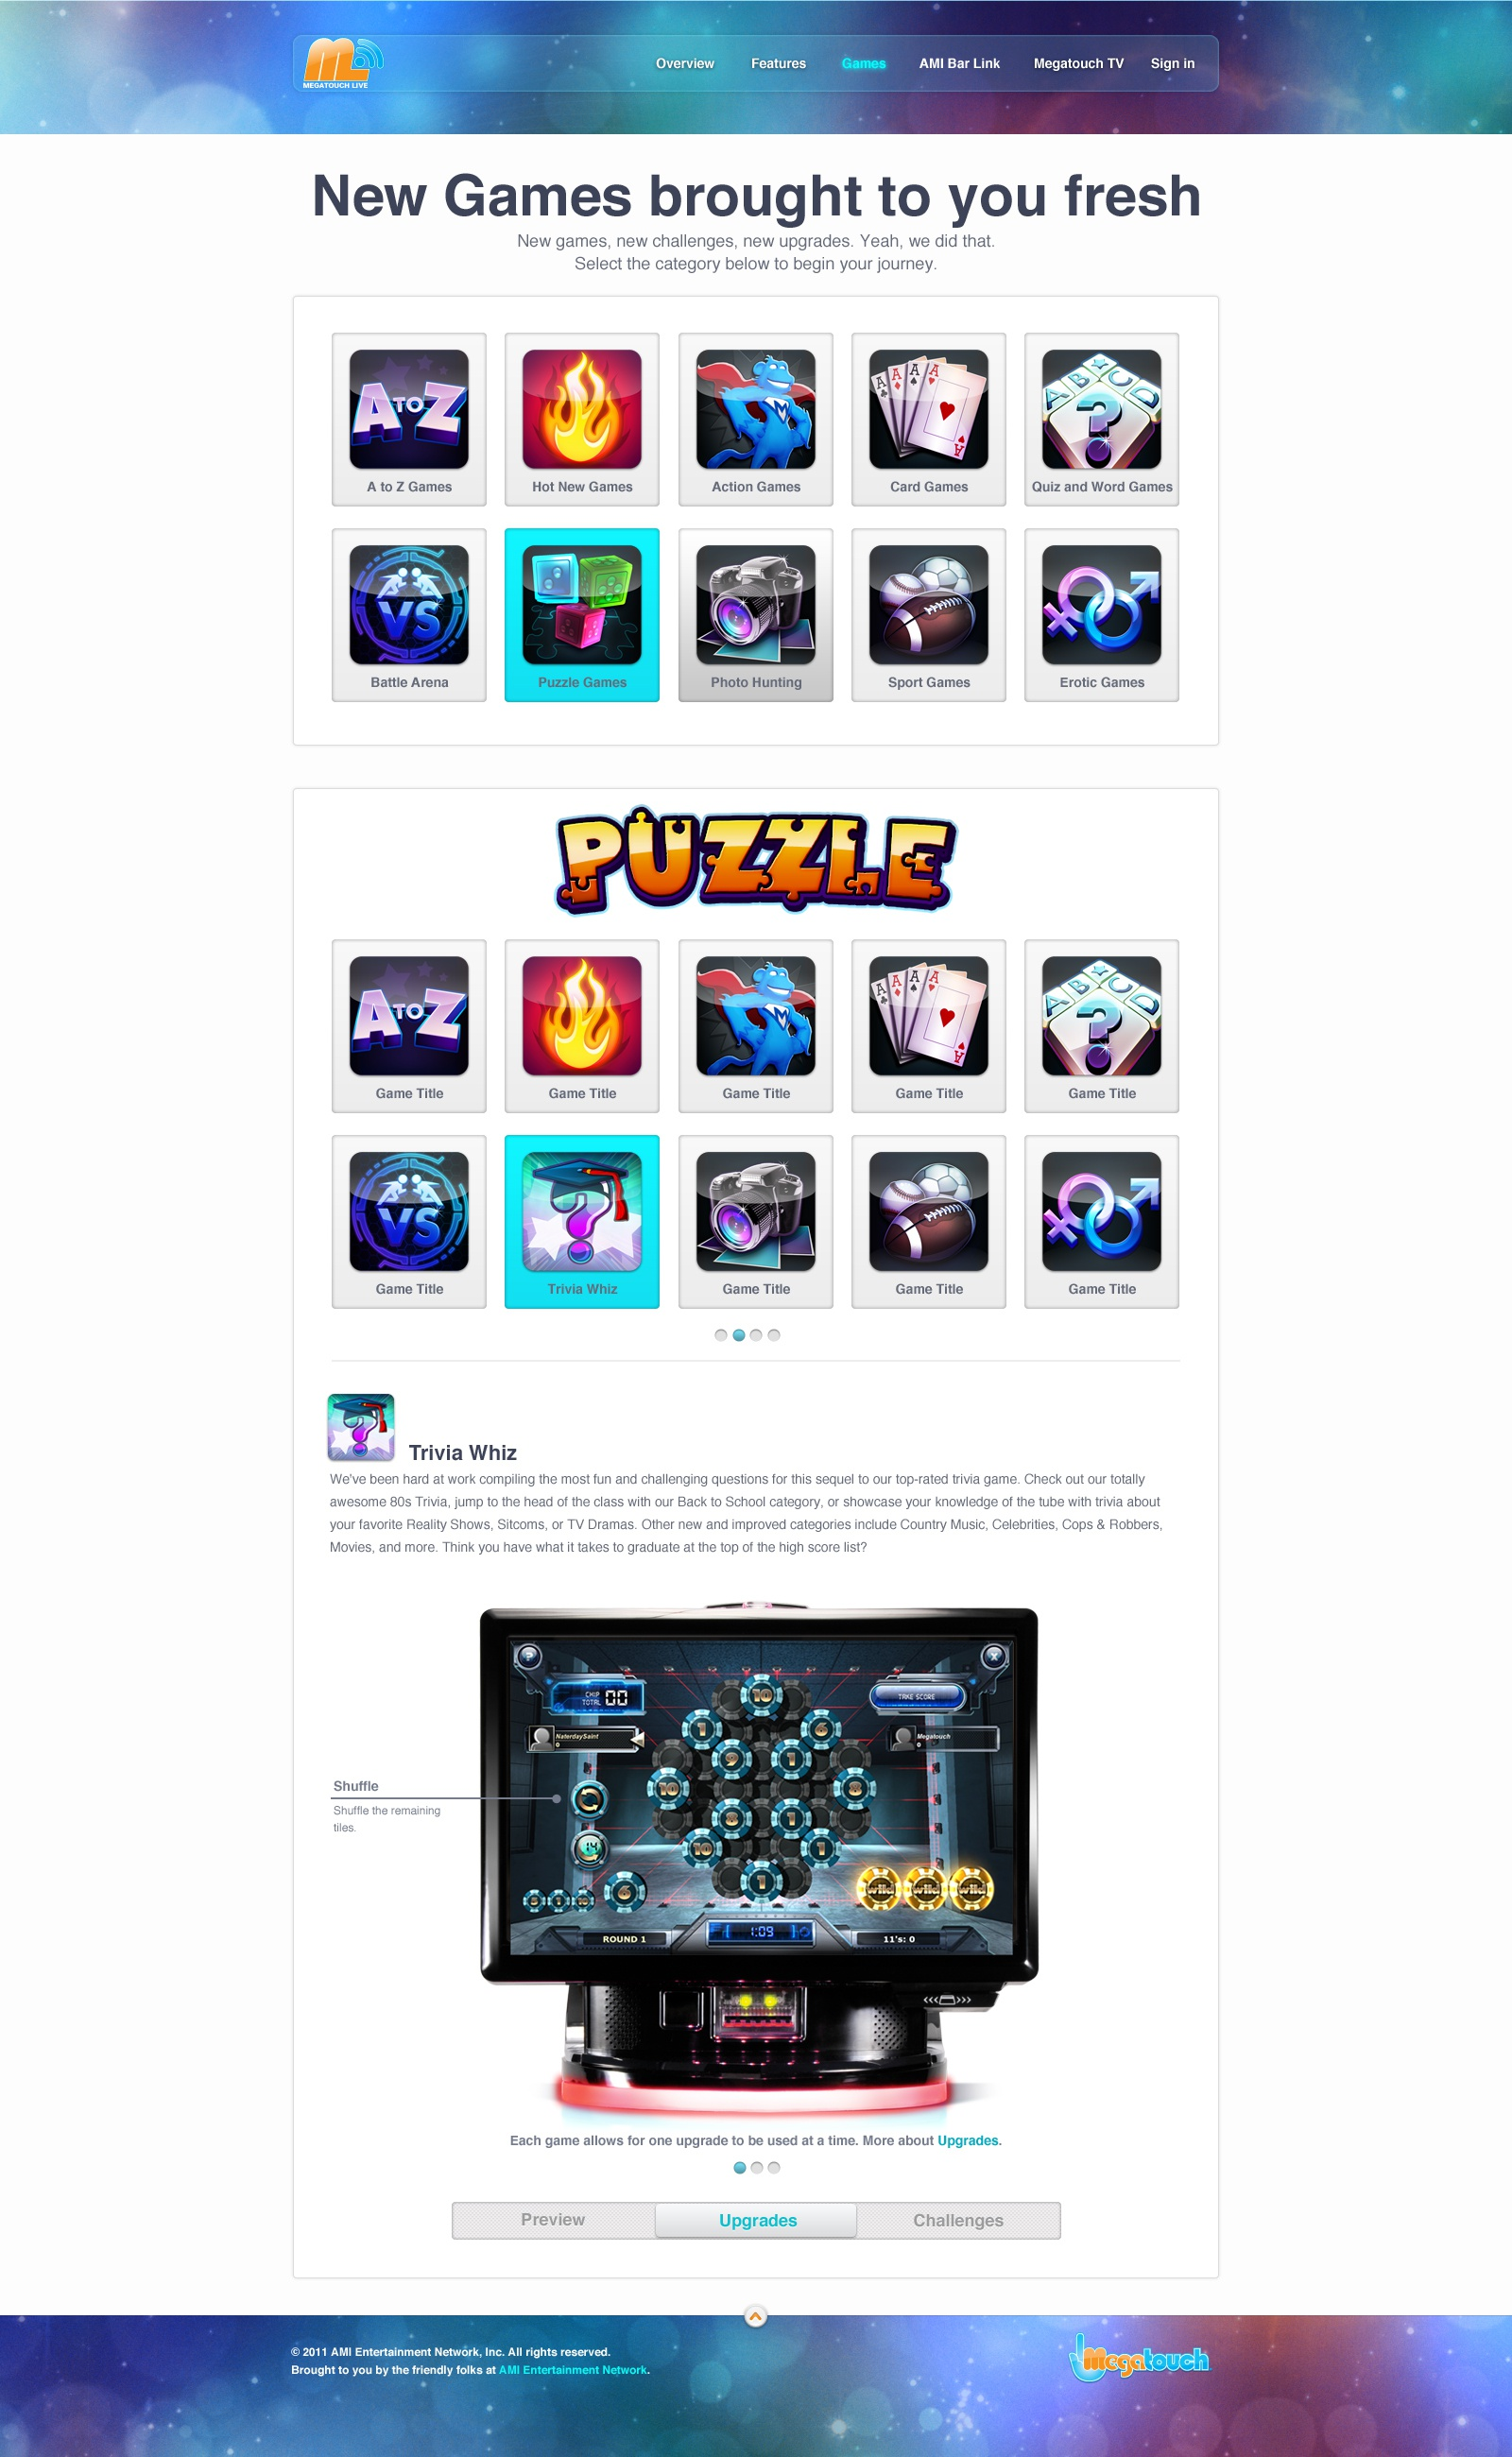 Games 3rdstep specificgame filter2 upgrades